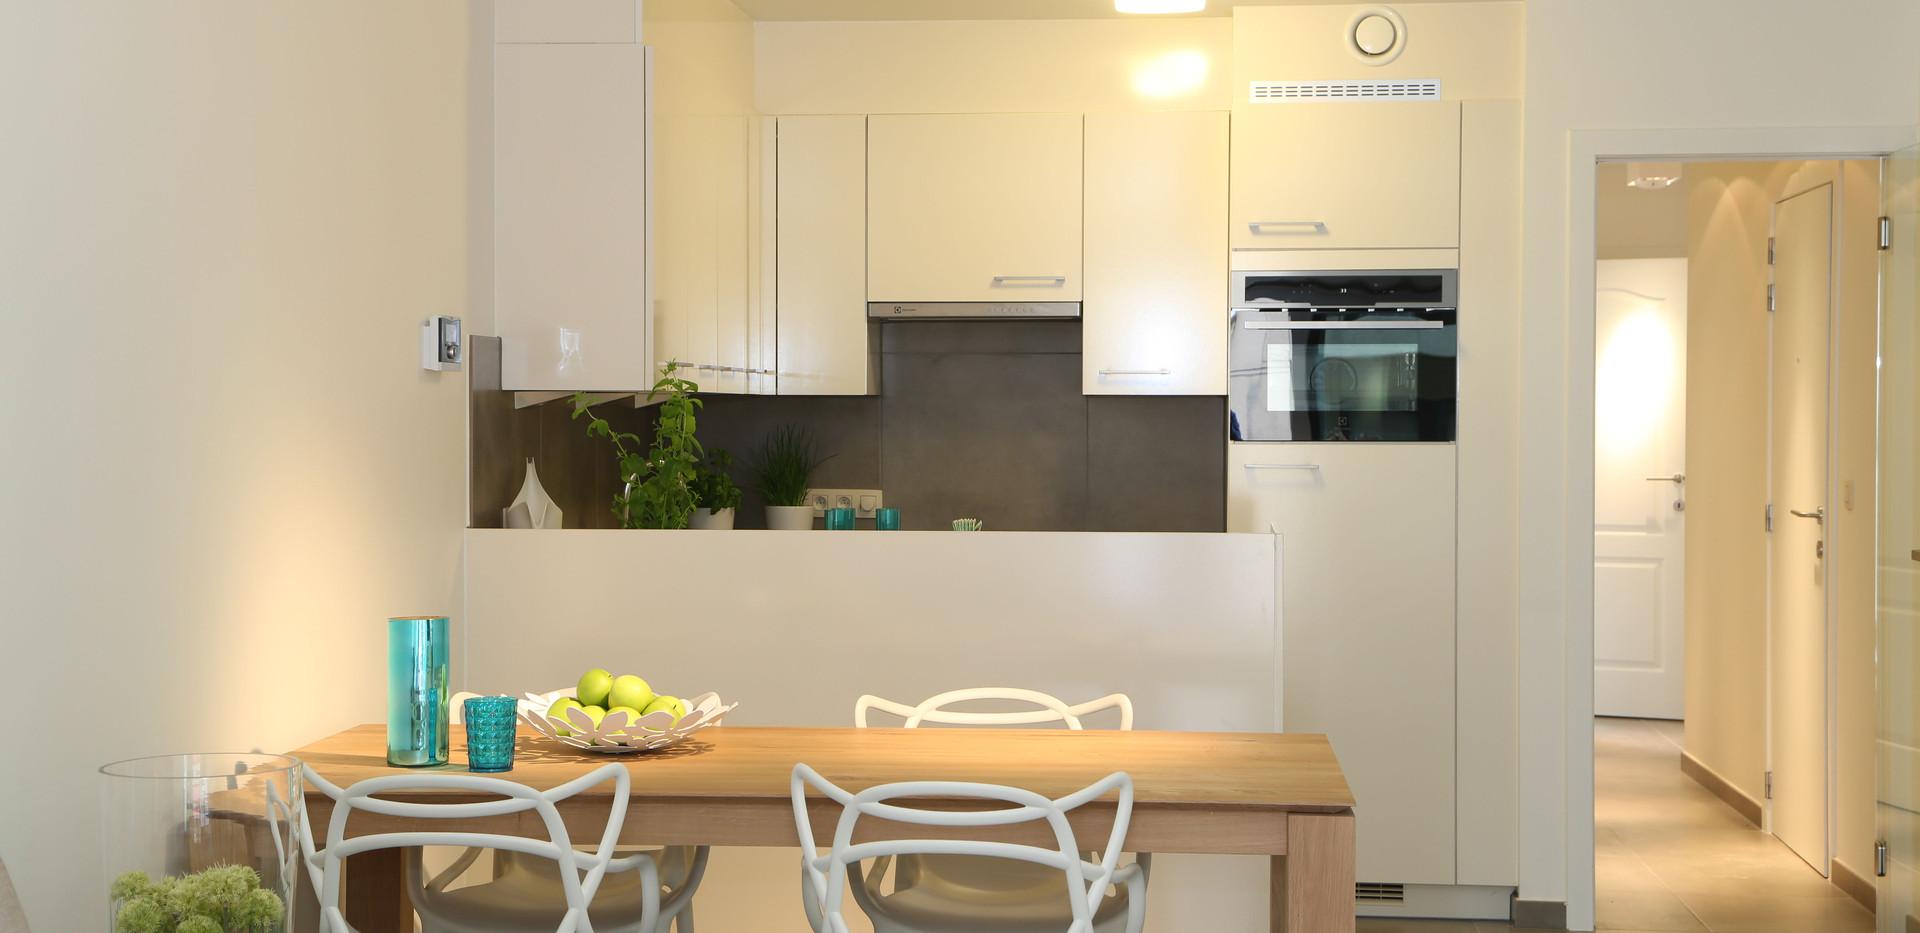 keuken en eethoek